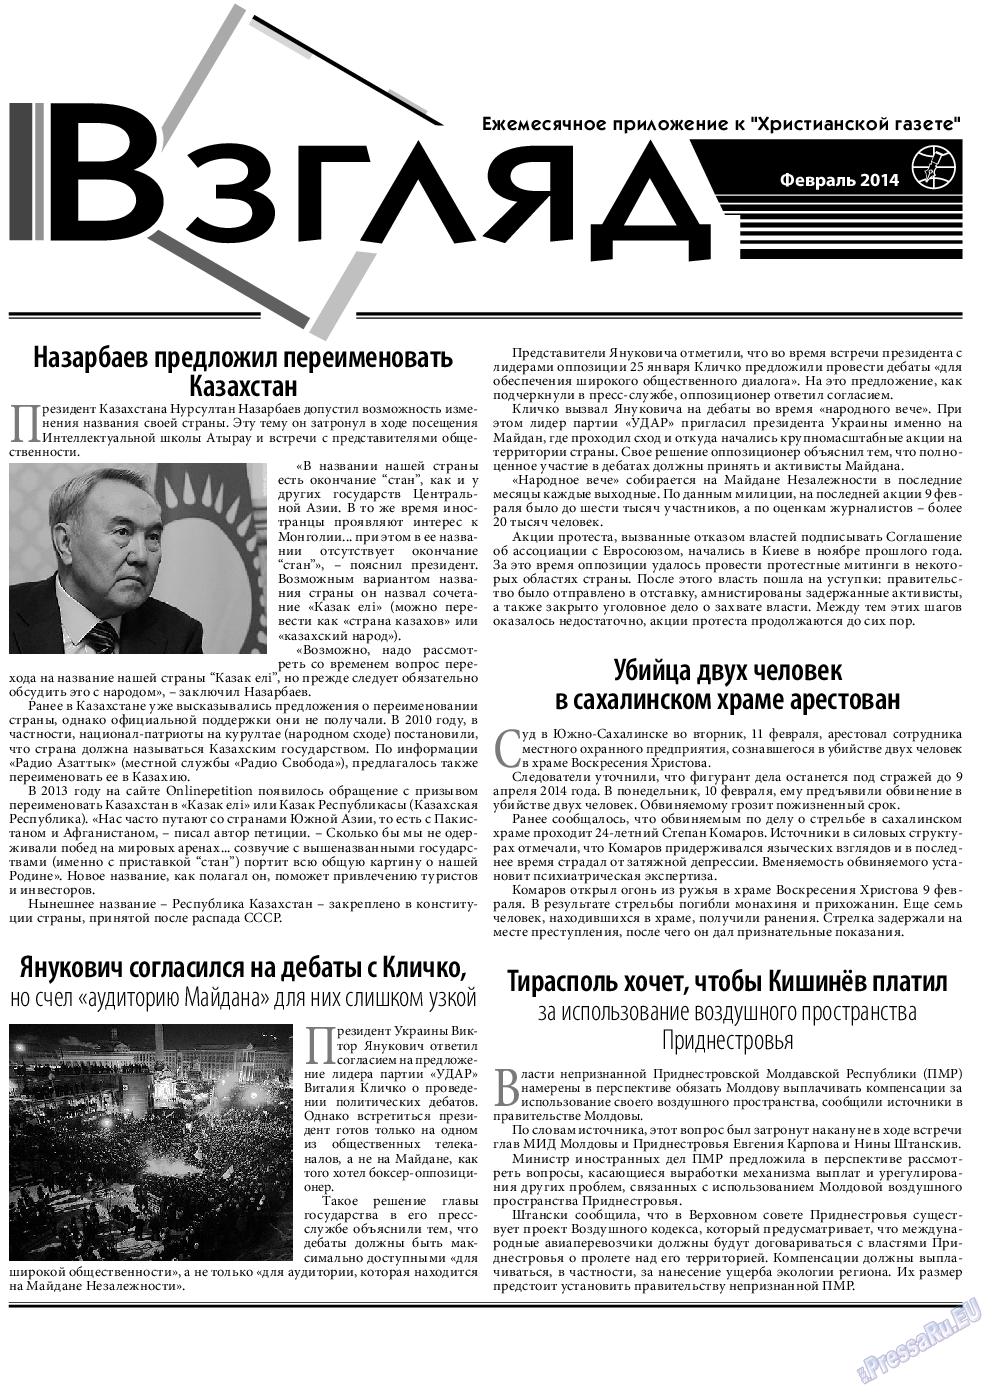 Новости кыргызстана сегодня азаттык